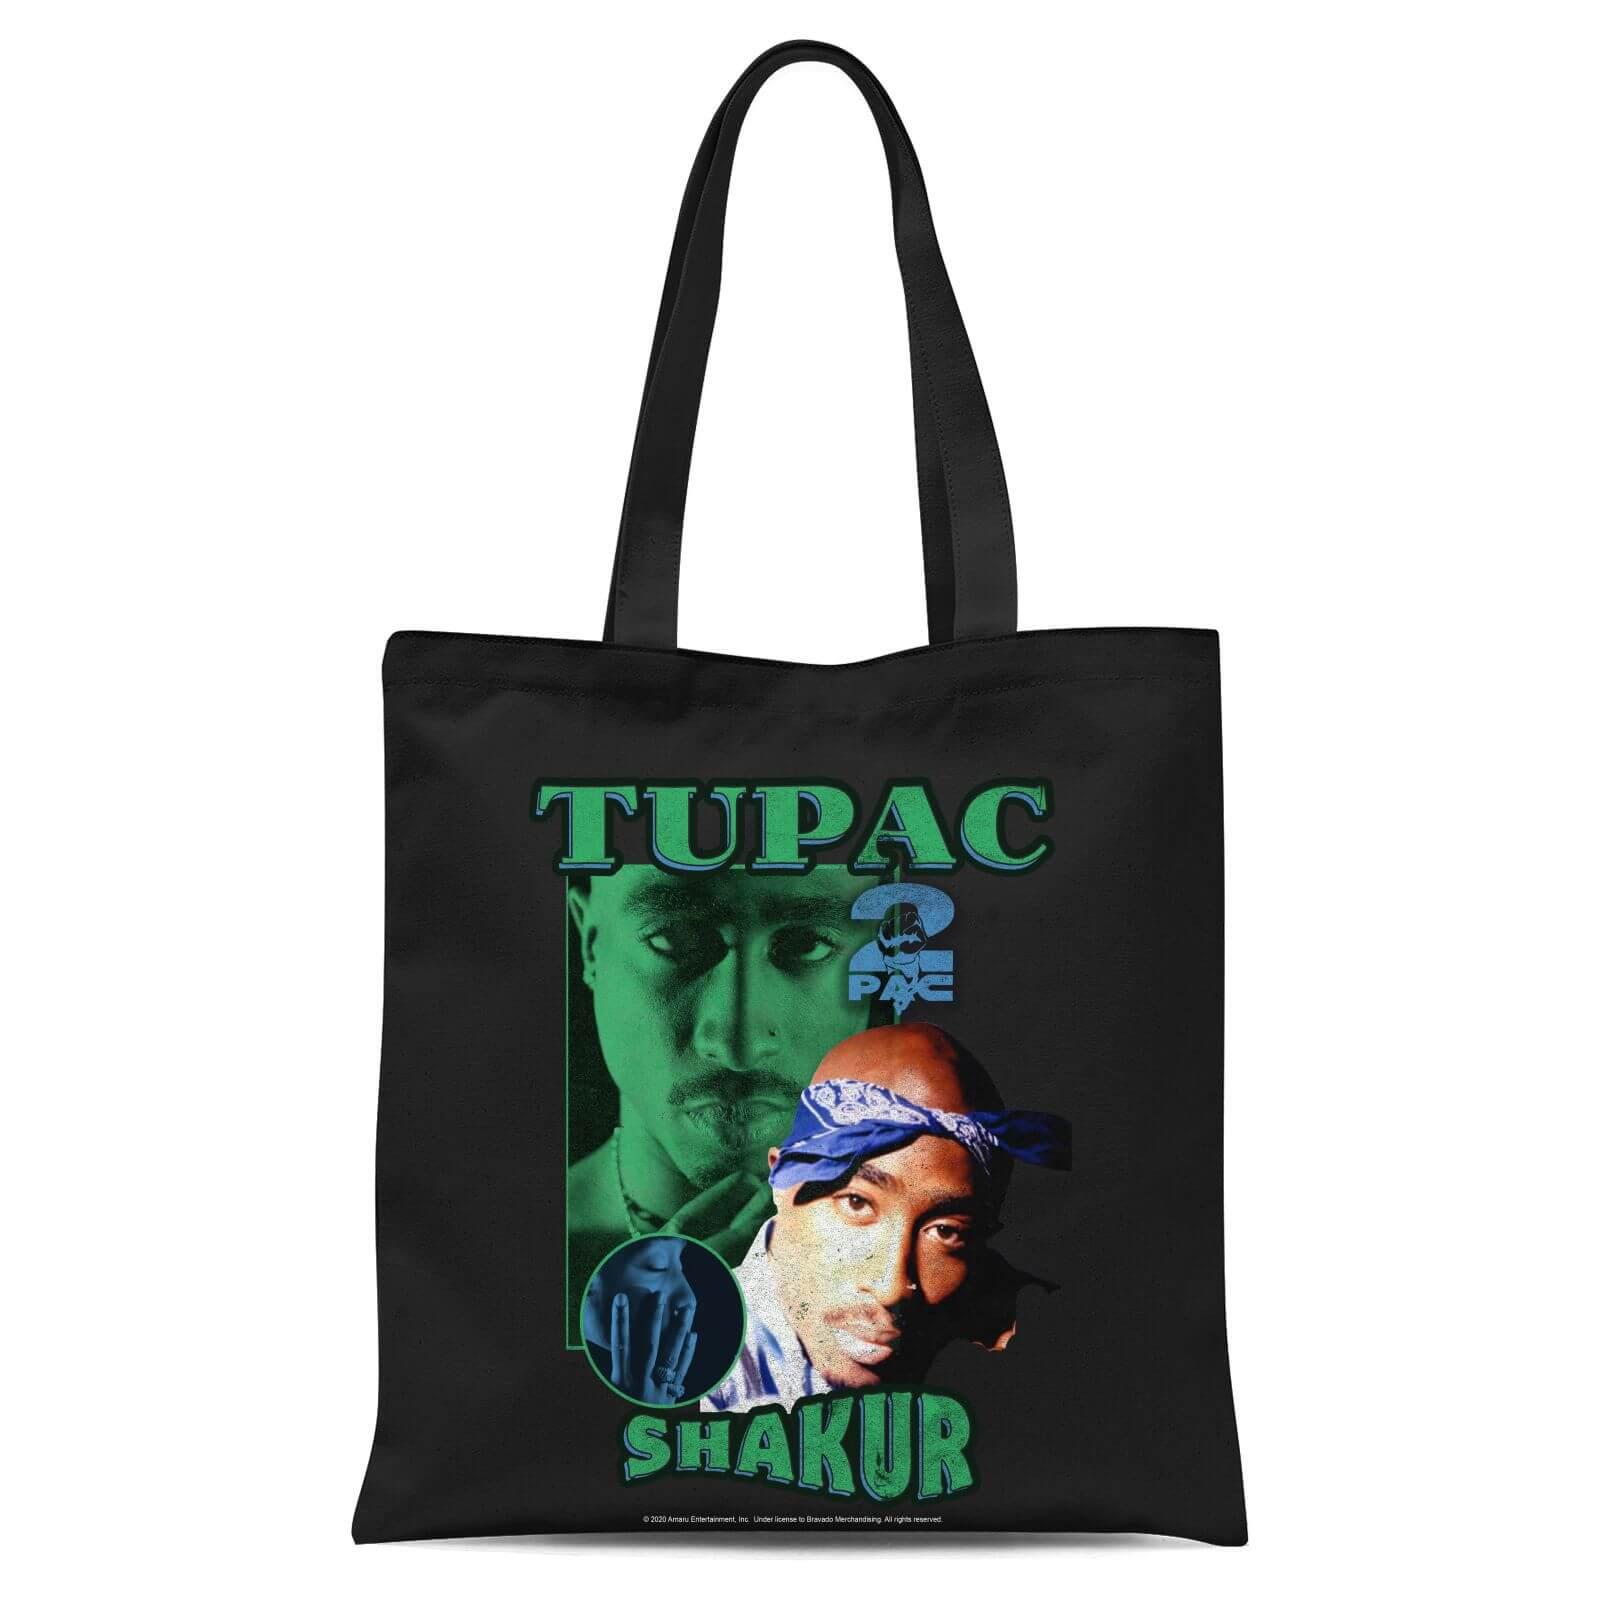 Tupac Shakur Tote Bag - Black